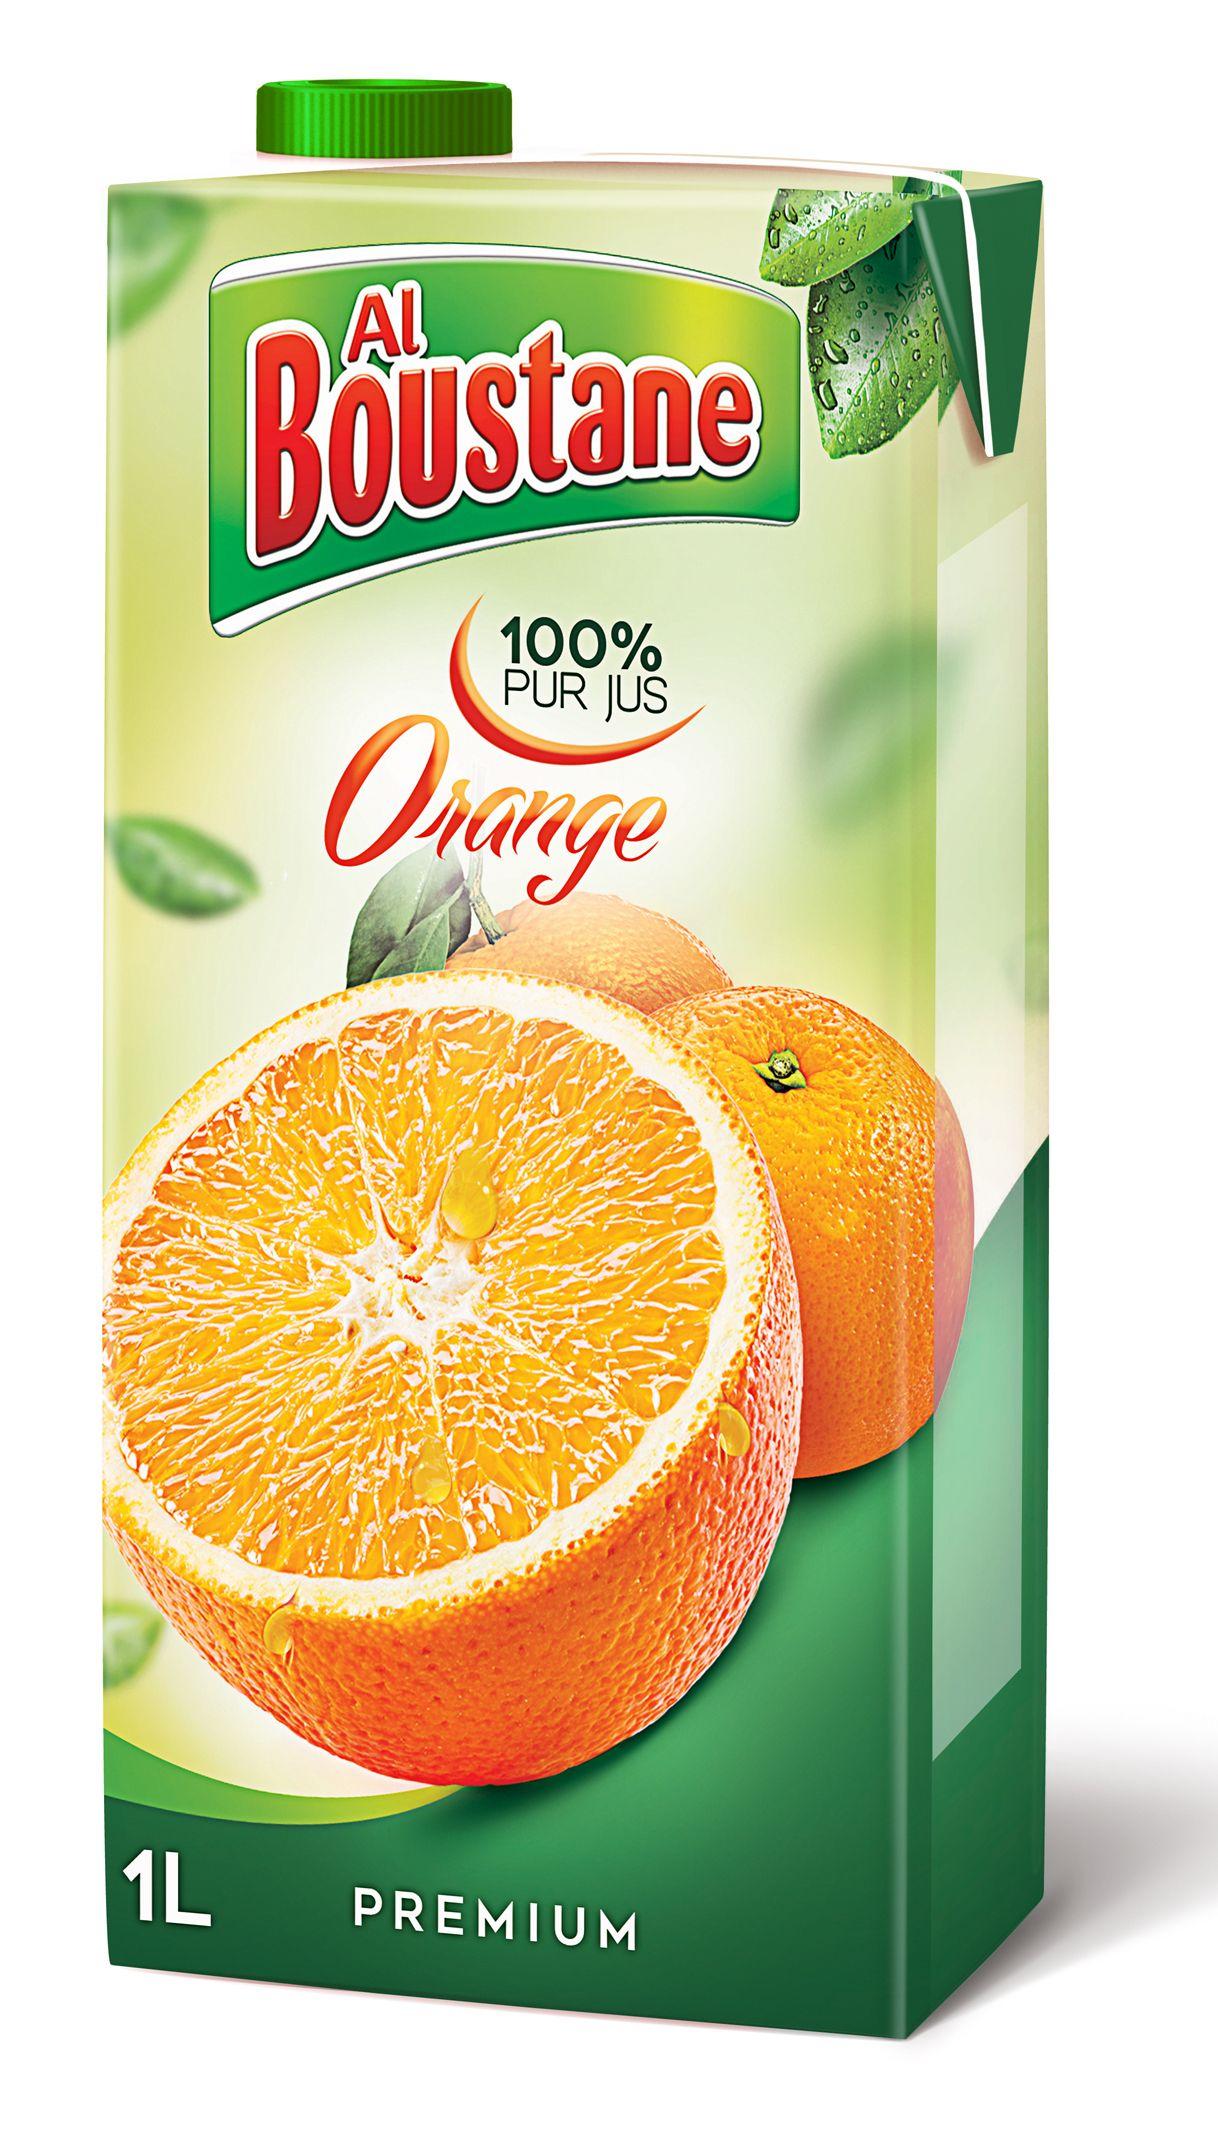 Conception Du Design Packaging Jus Dorange Al Boustane